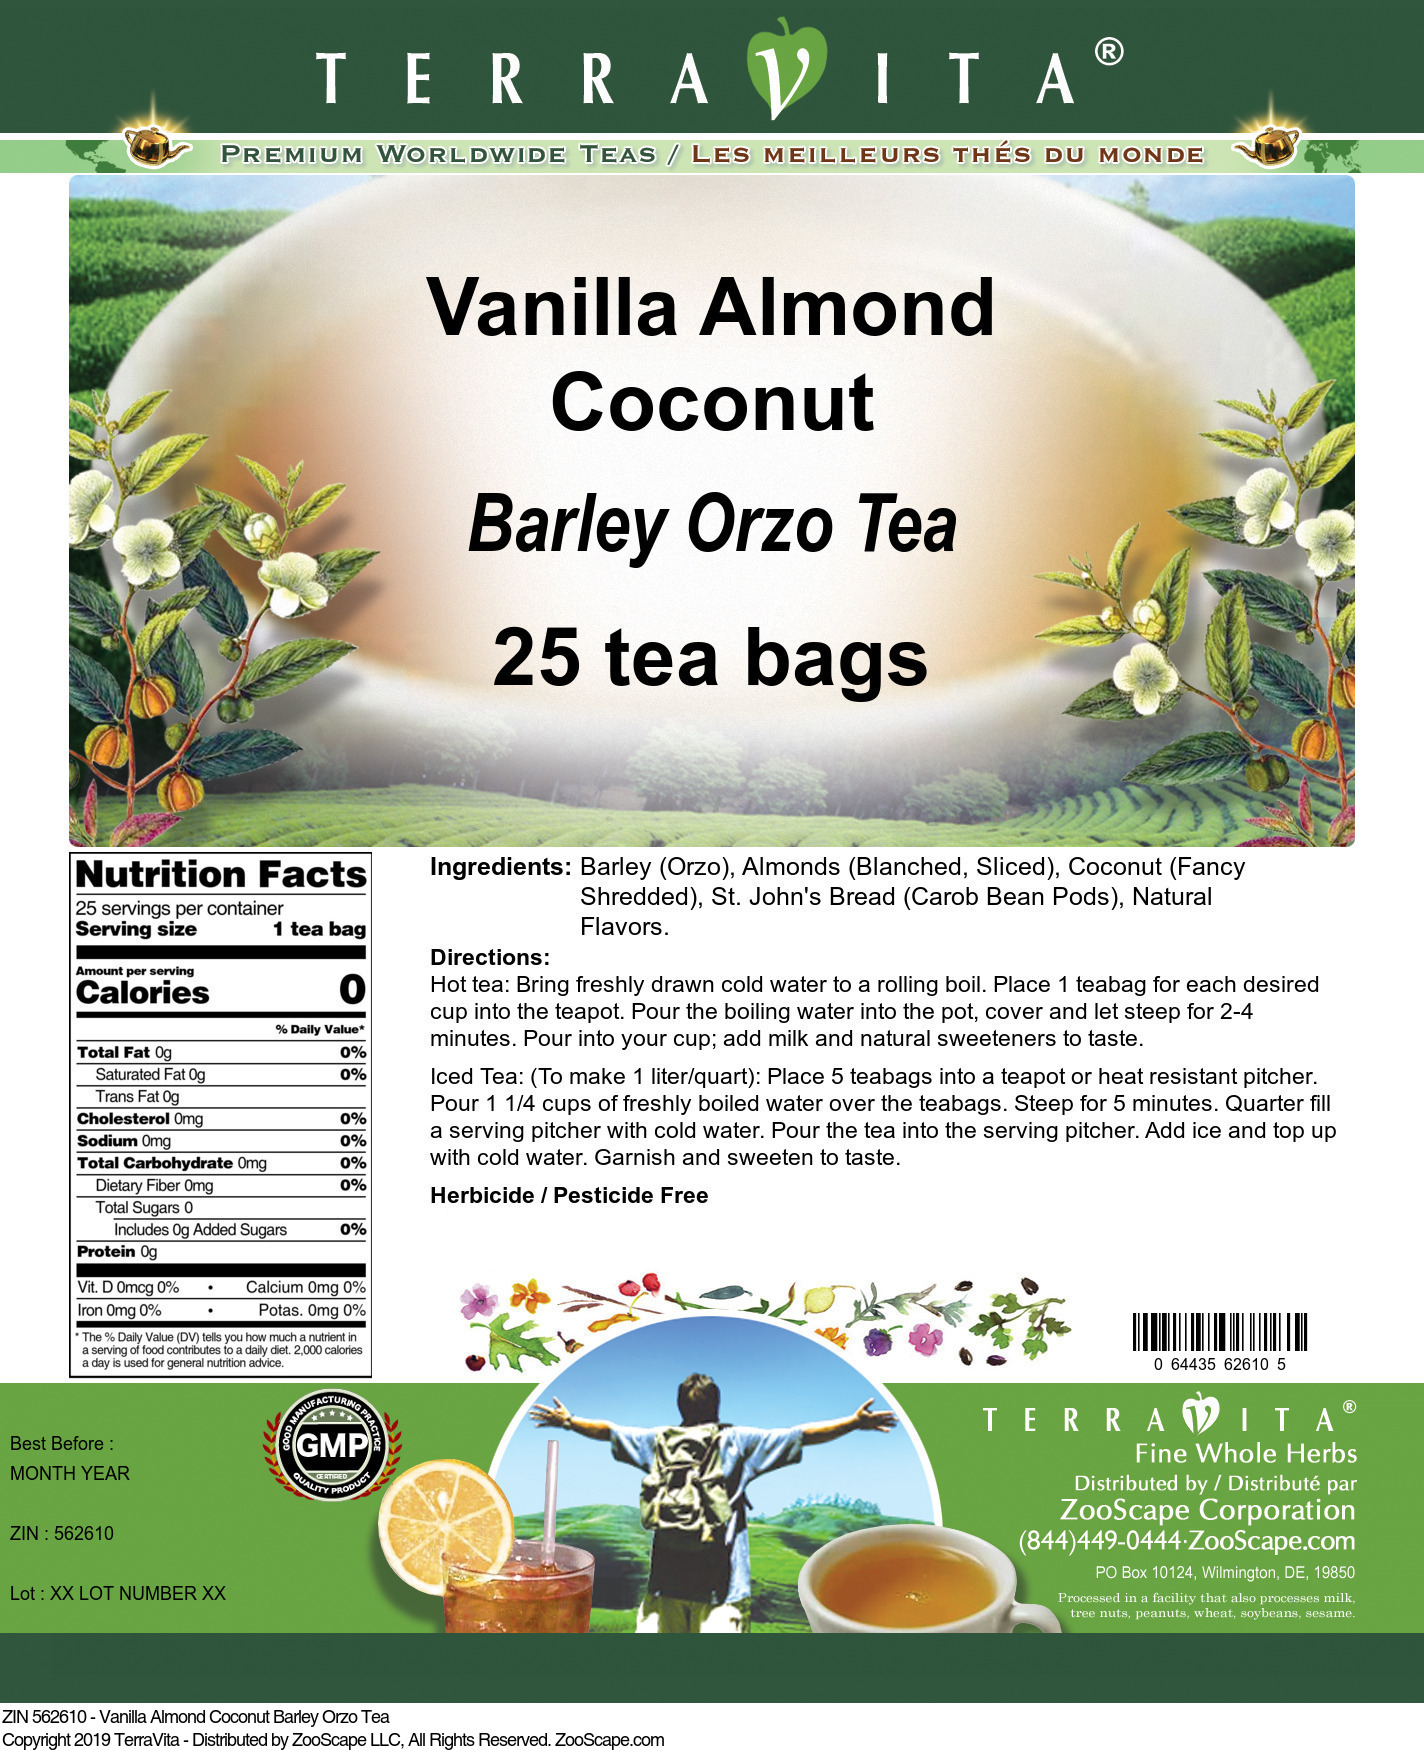 Vanilla Almond Coconut Barley Orzo